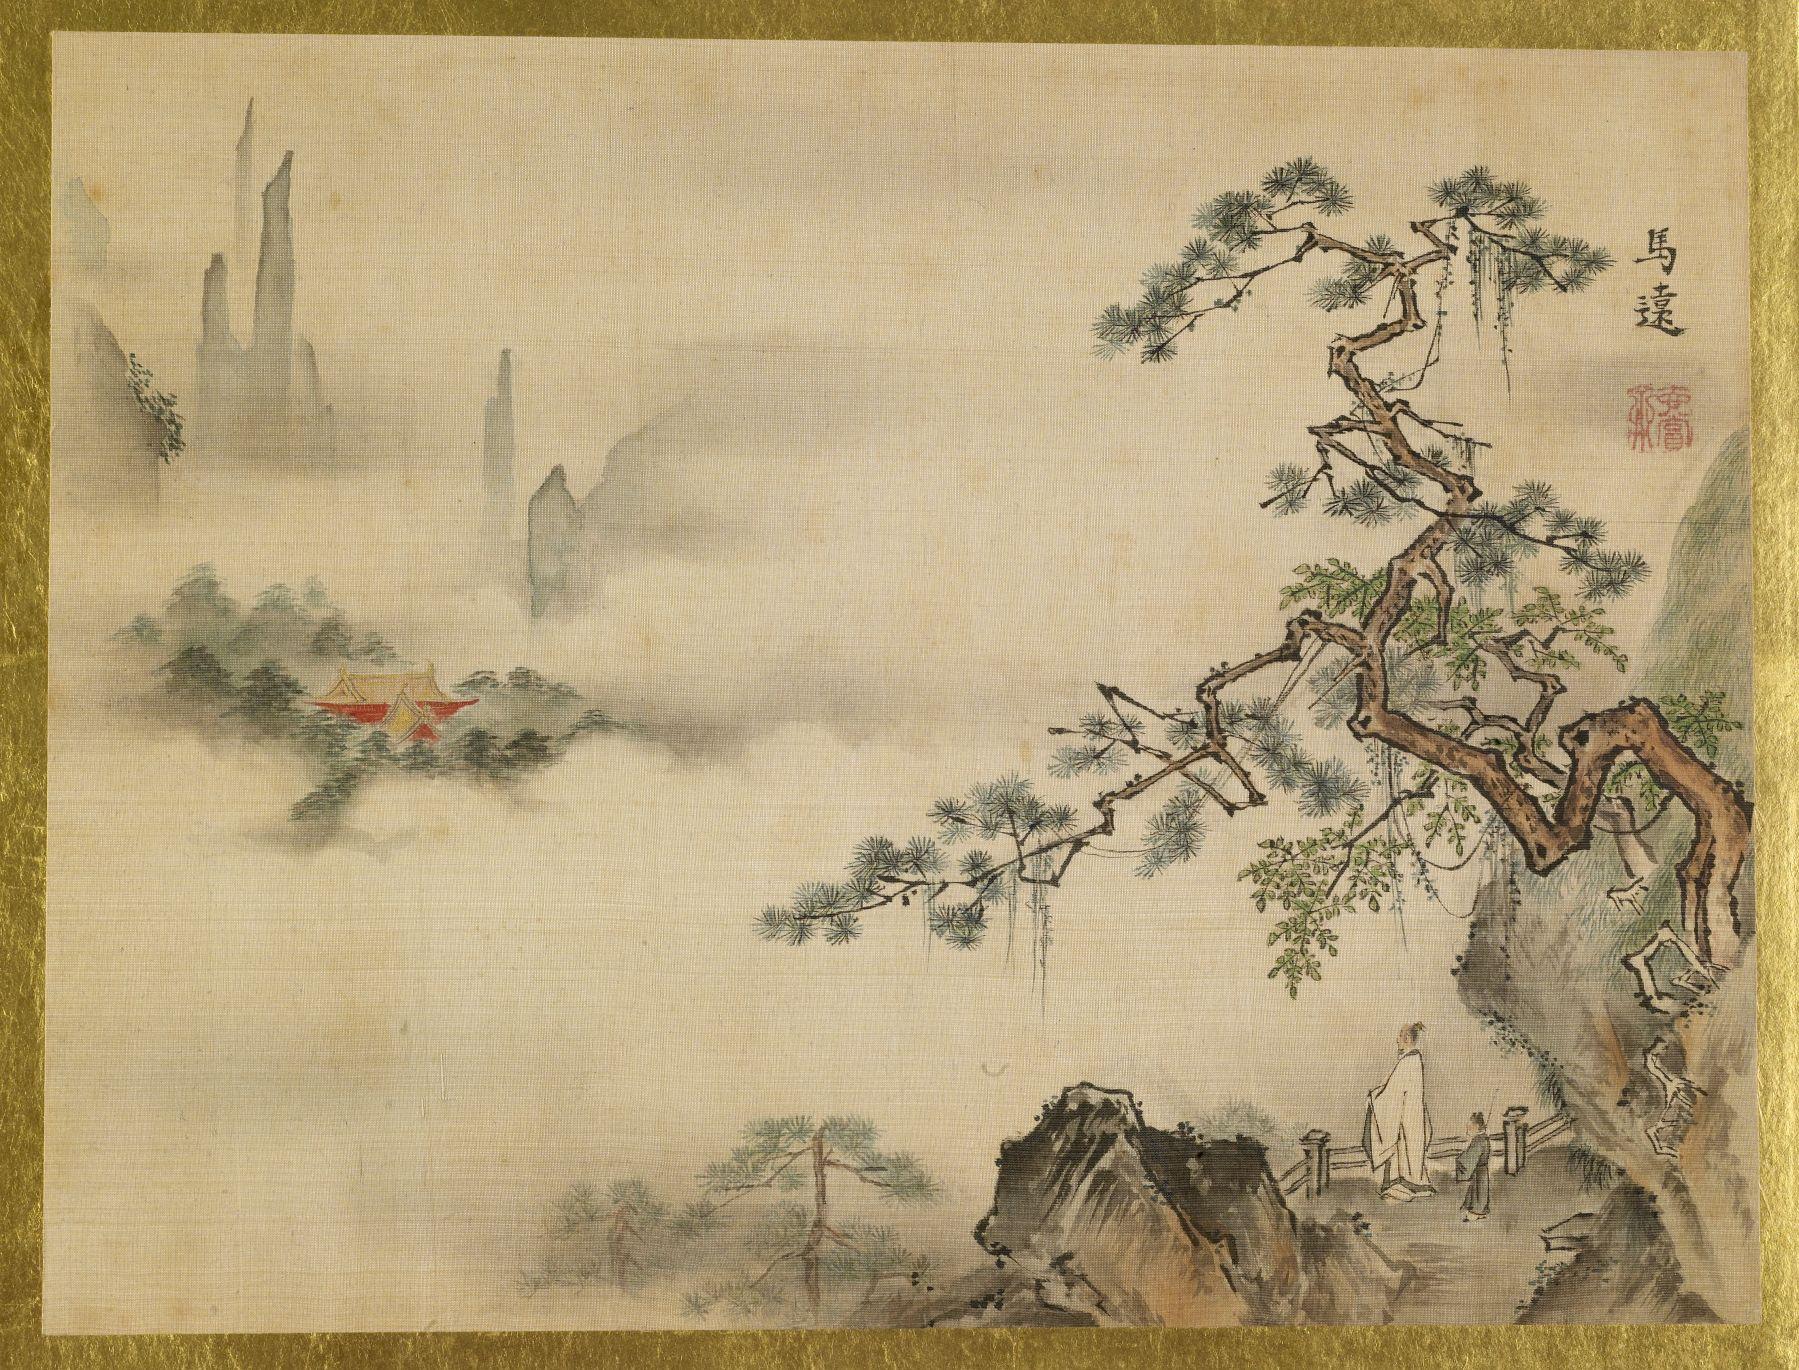 Japanese Landscape Prints - Google